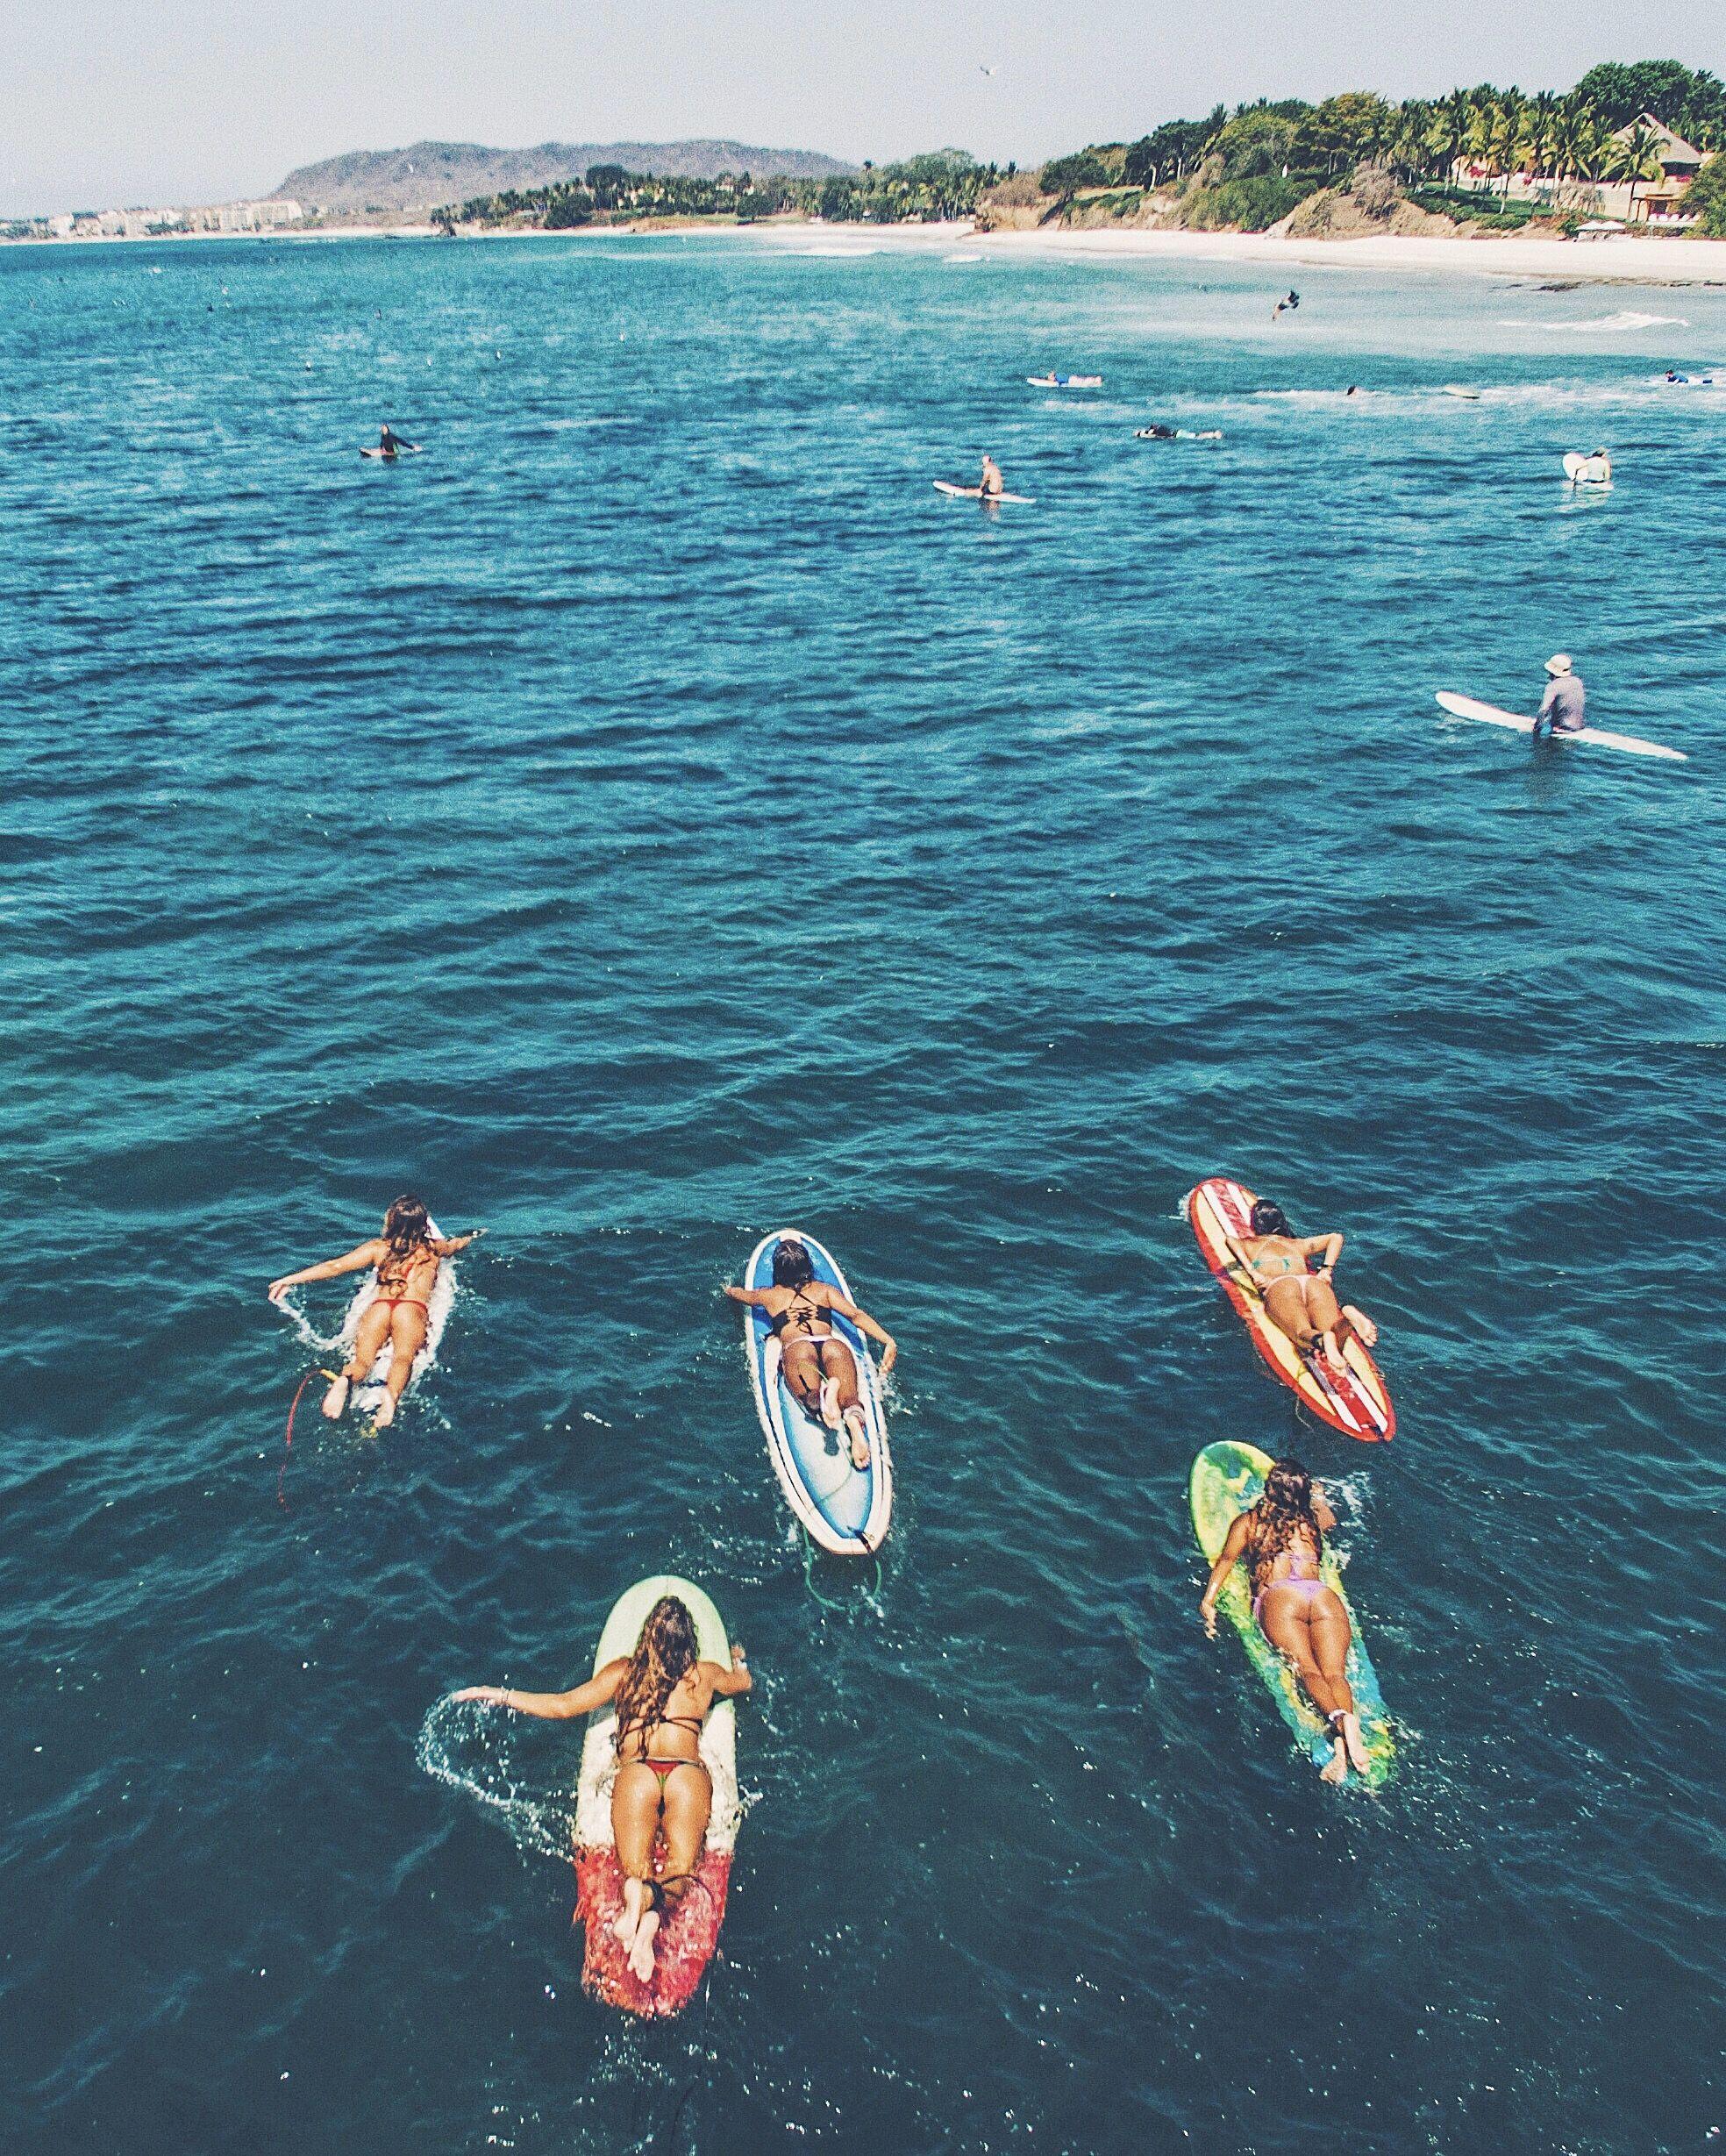 Surf S Up At Burros In Punta De Mita Mexico Surf Trip Surfing Surf City